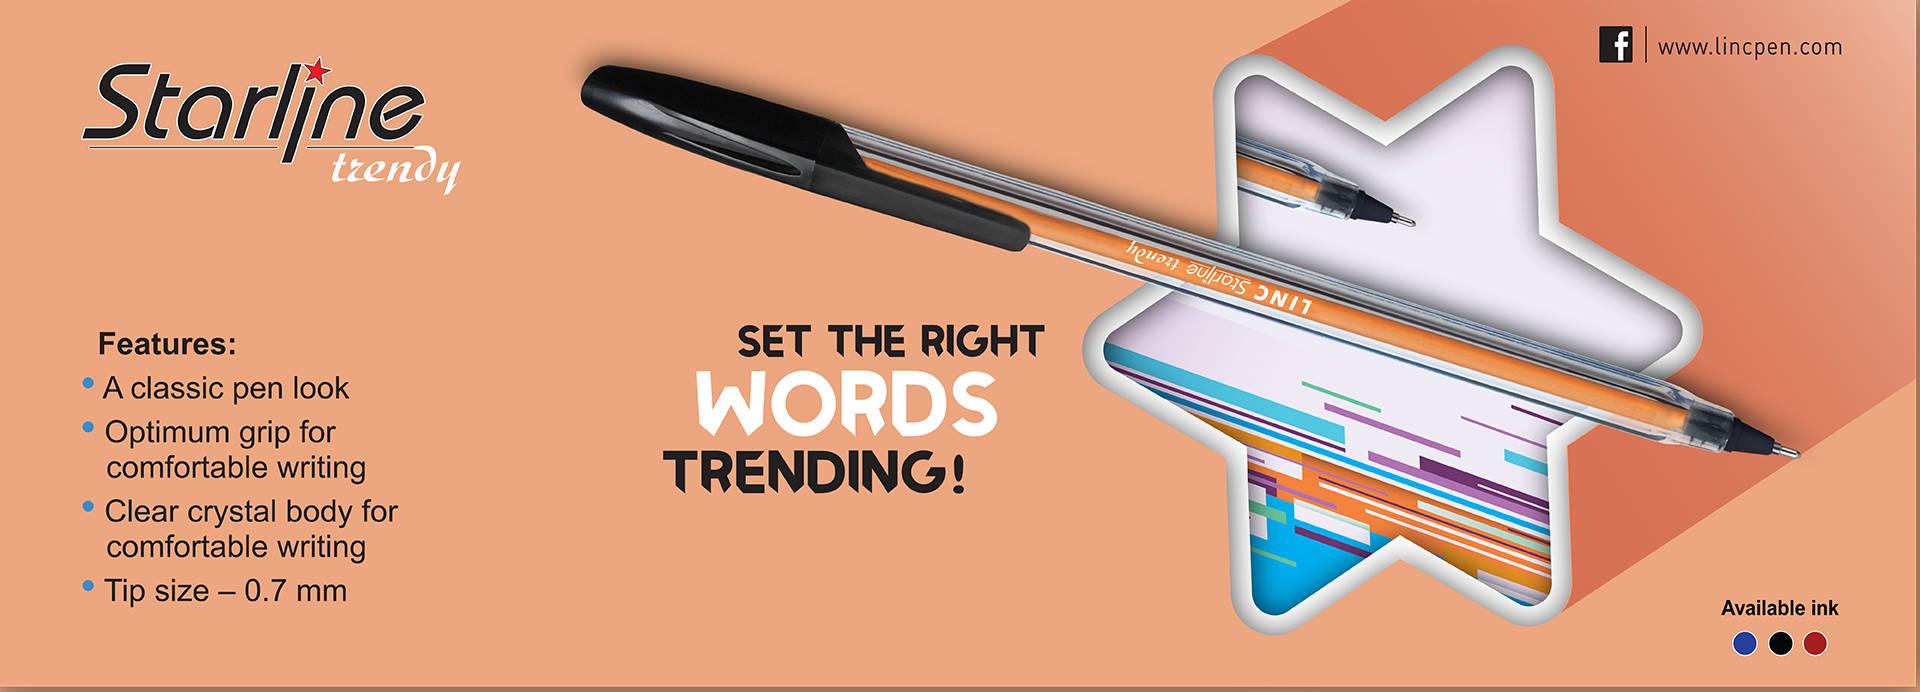 linc starline trendy pen